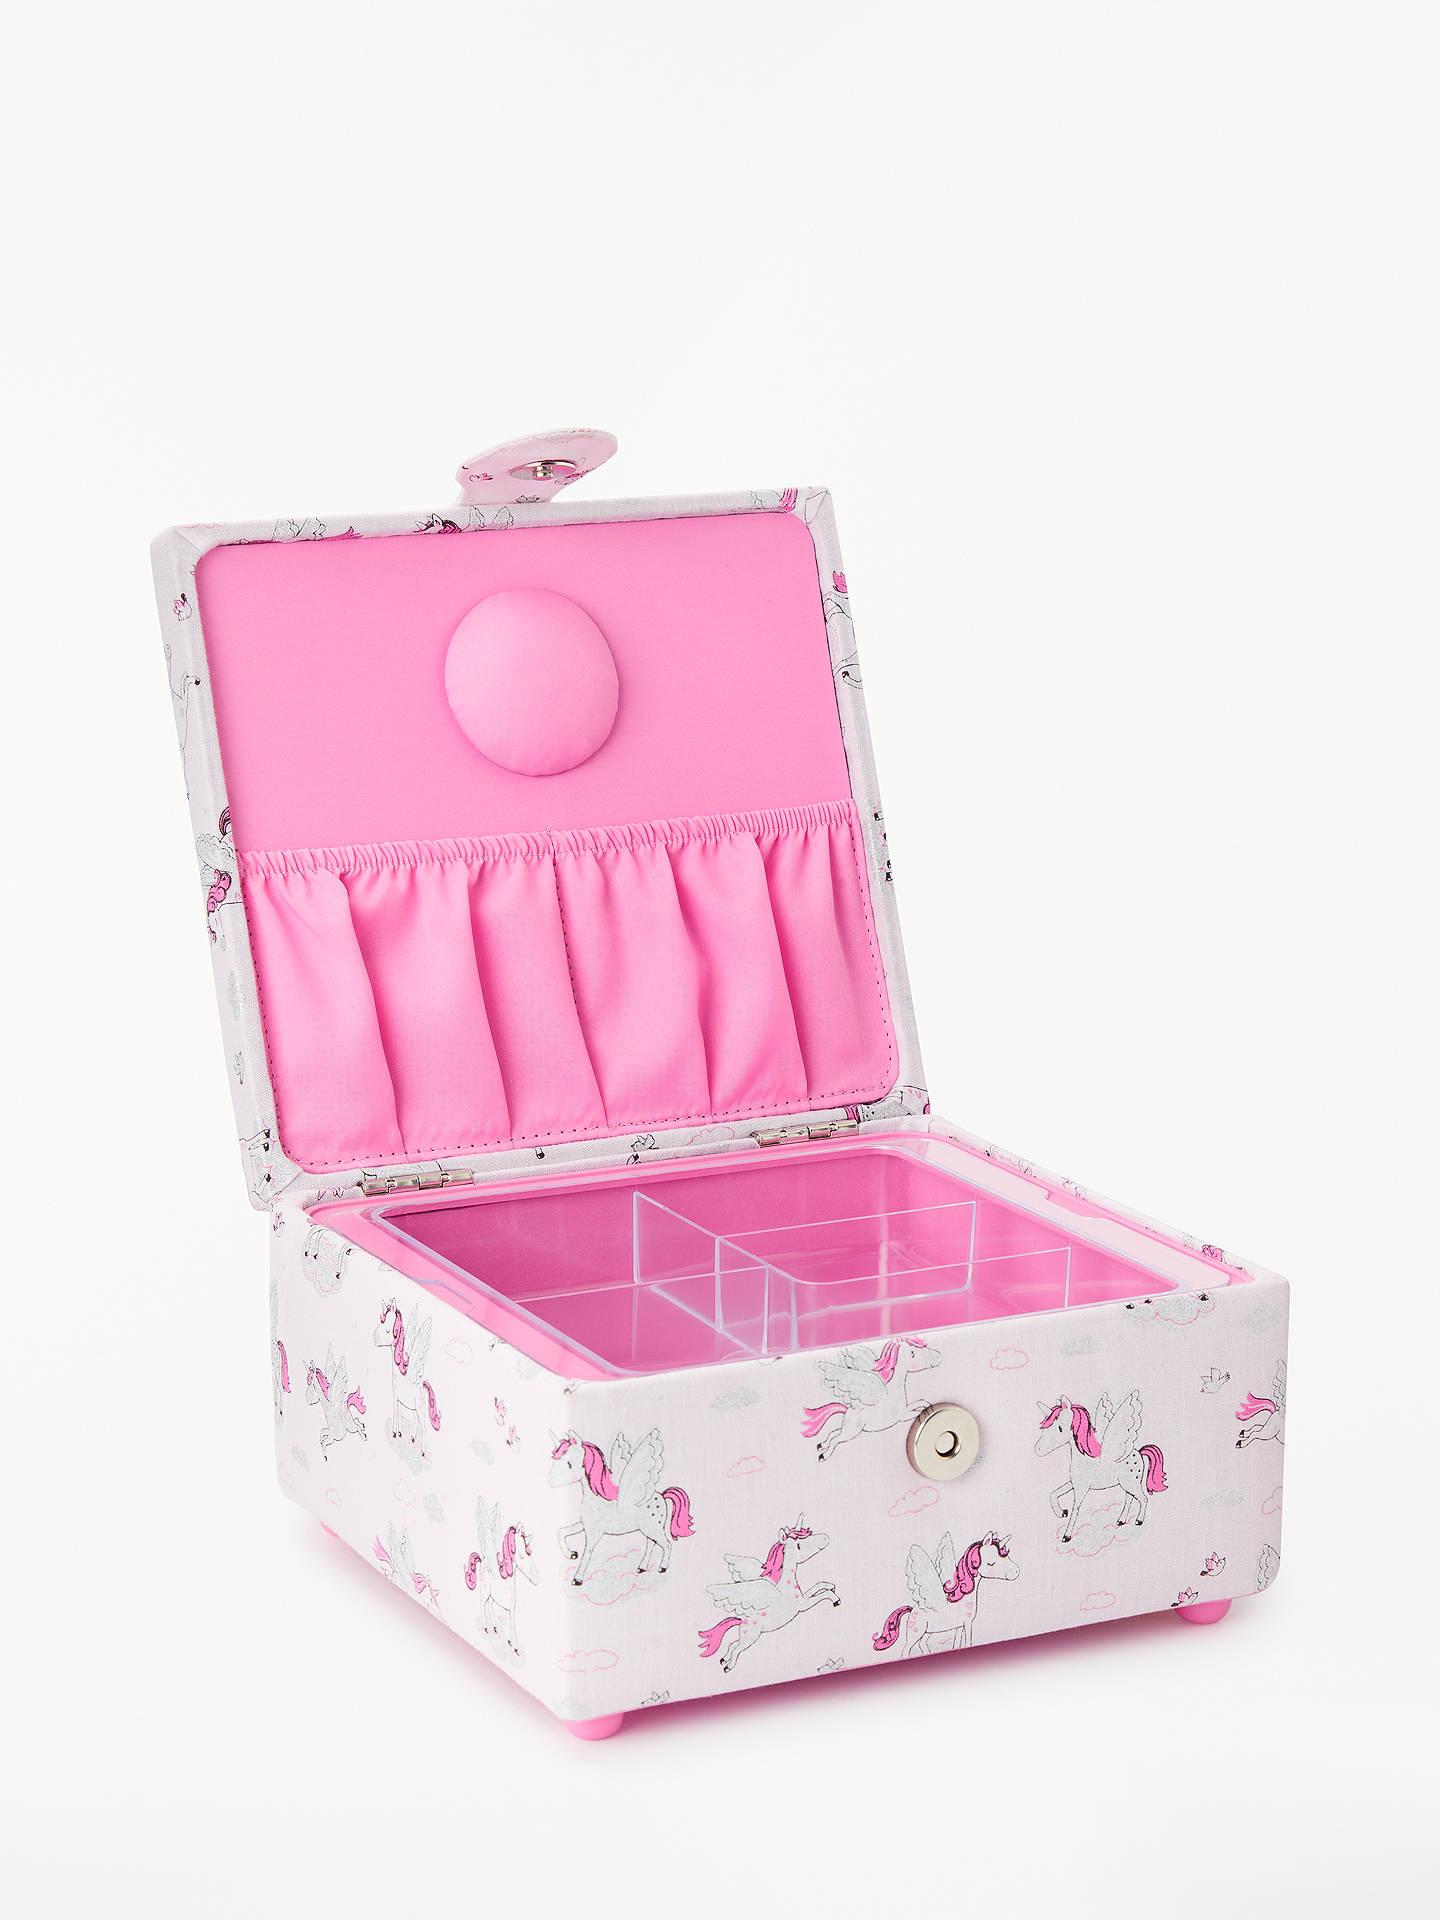 ab9510ff7b6f John Lewis & Partners Metallic Unicorn Print Small Square Sewing Basket,  Pink